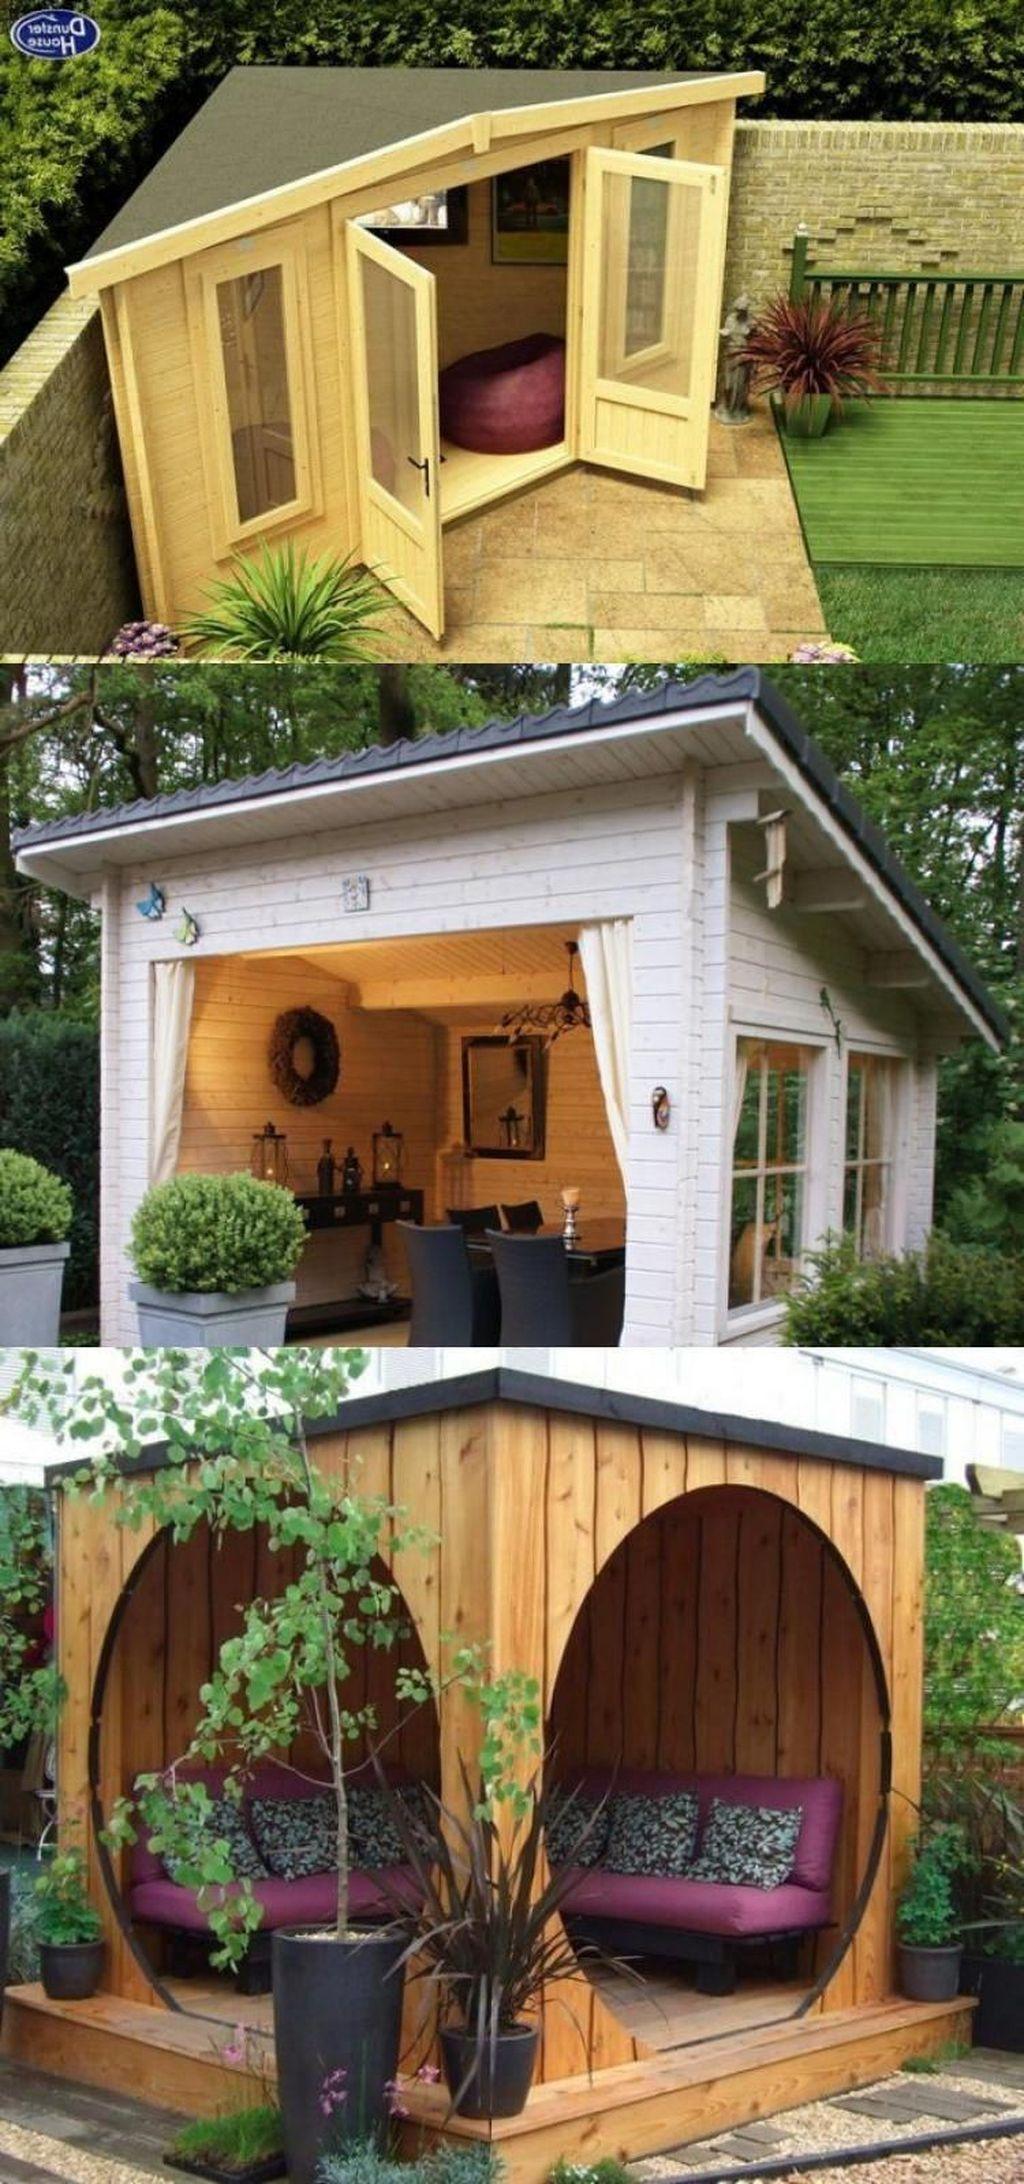 41 Creative Diy Backyard Gazebo Design Decoration Ideas – OMGHOMEDECOR